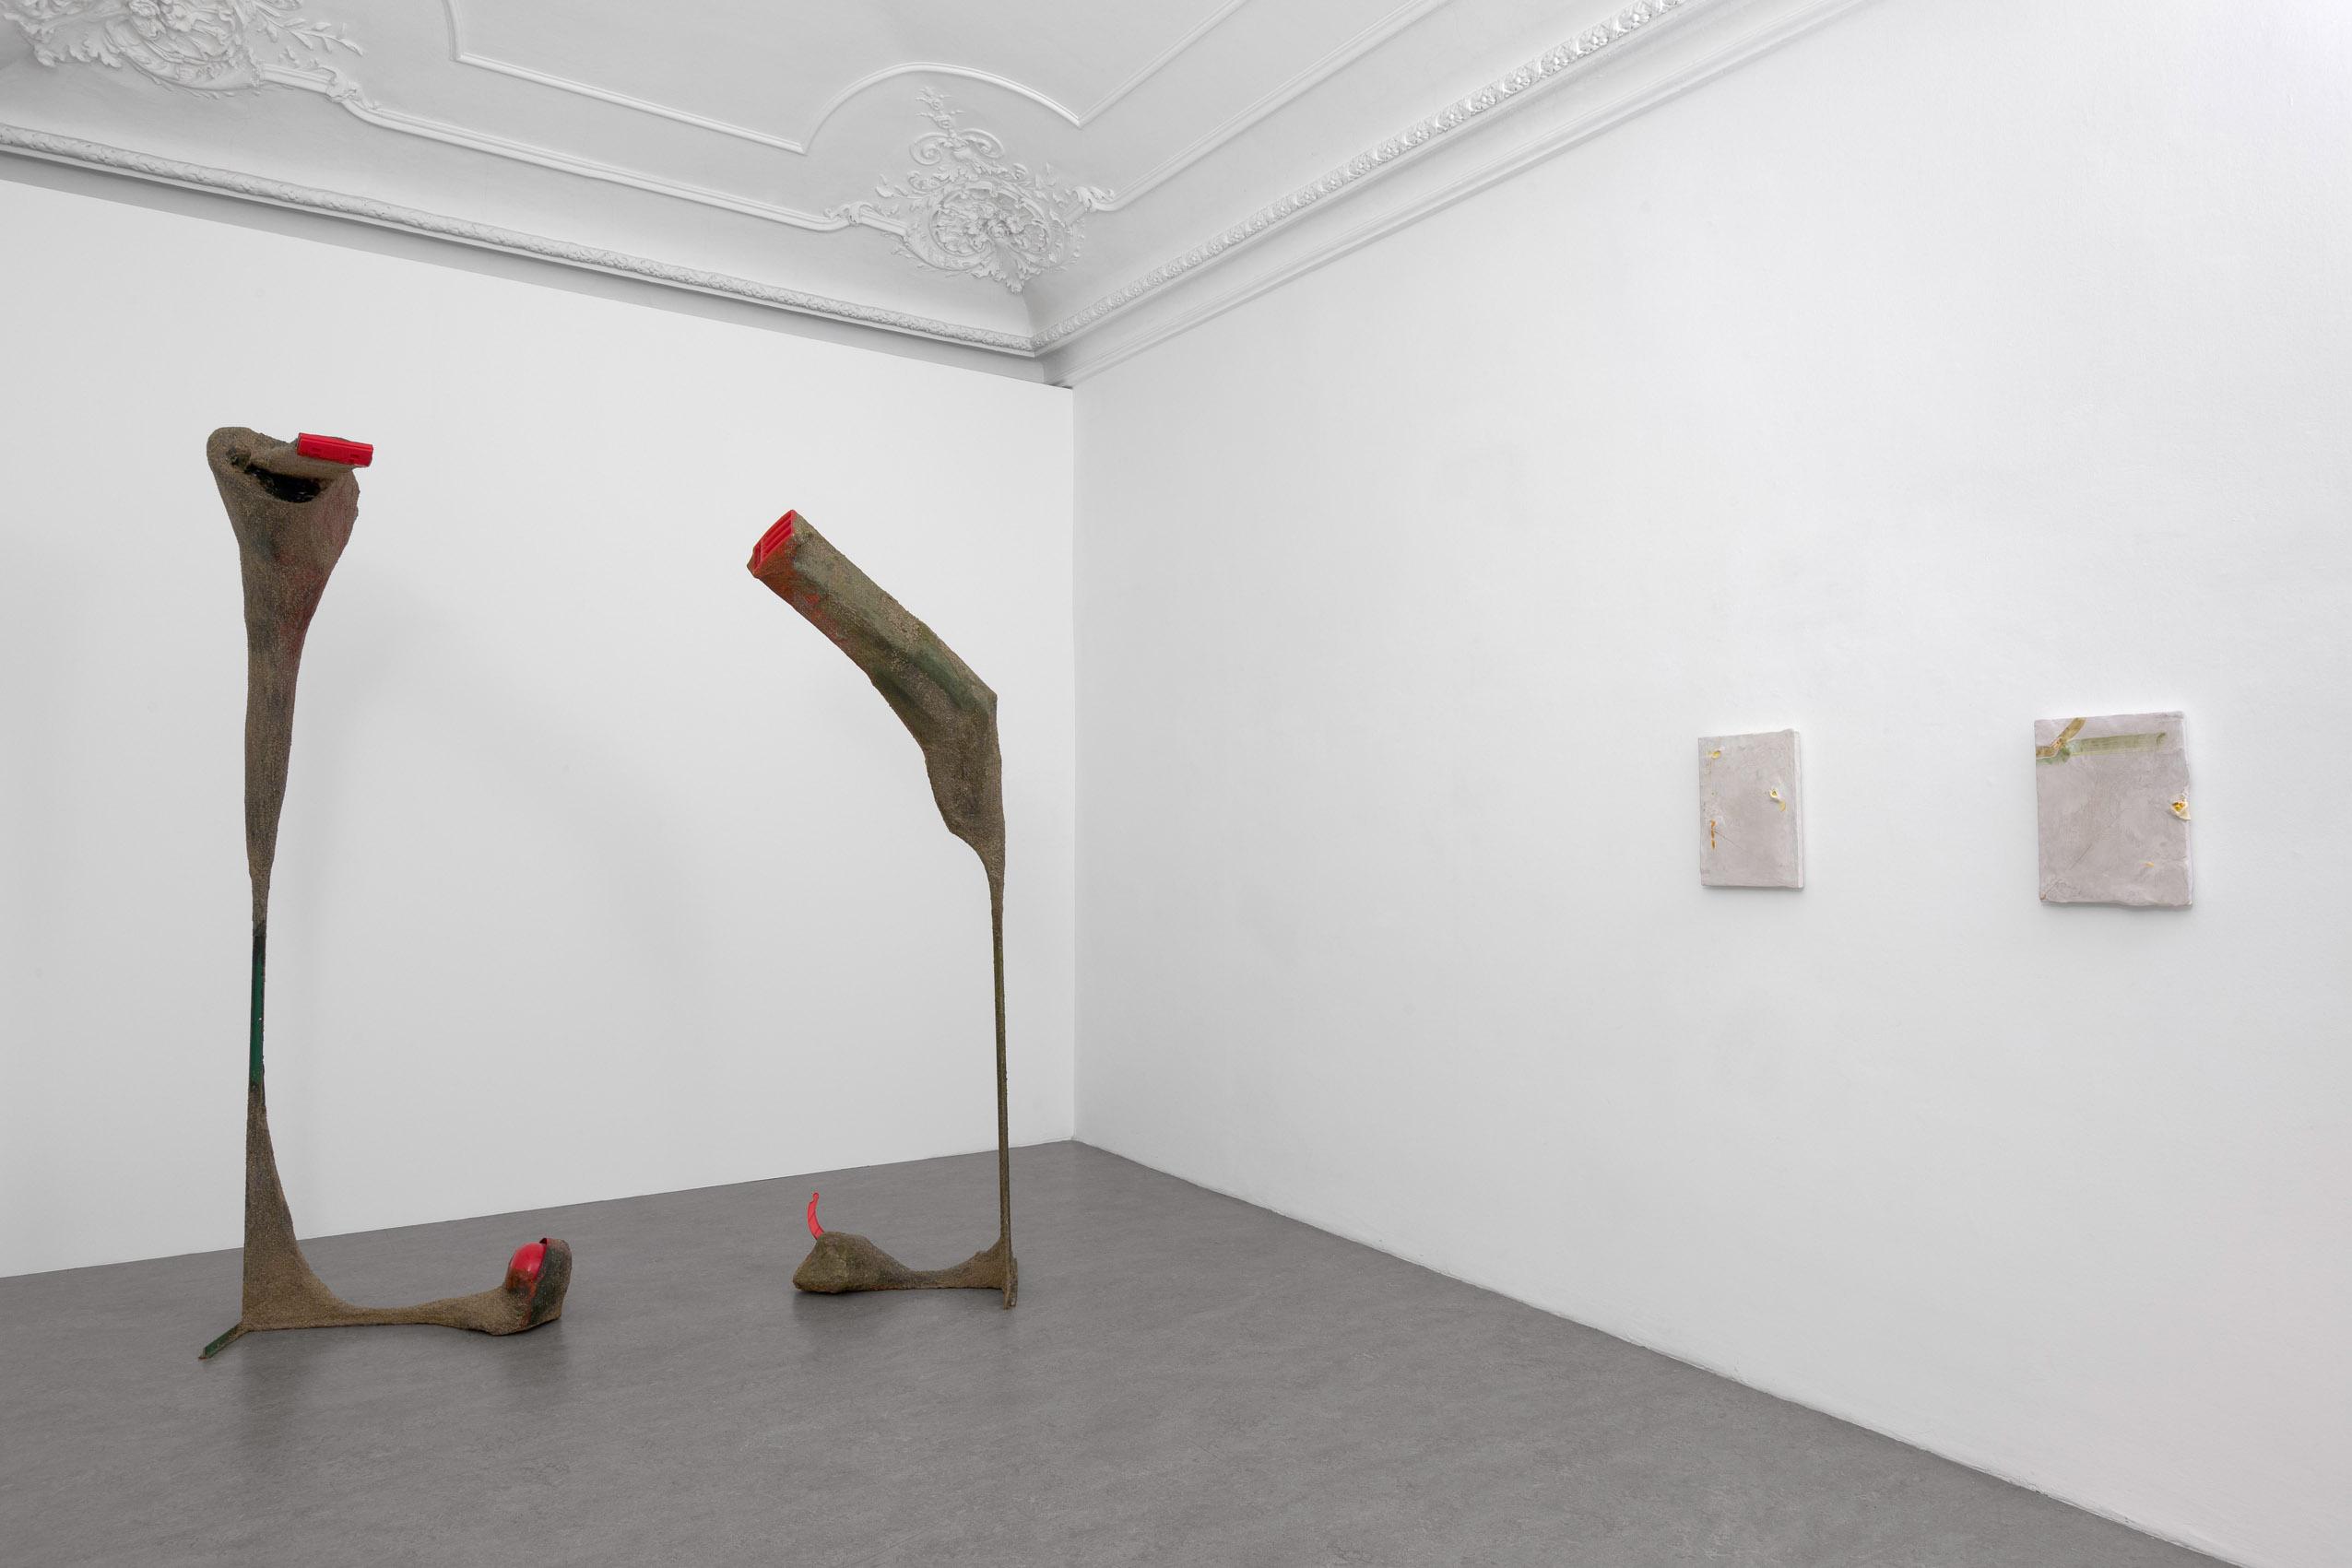 Francesca-Ferreri-Cluster-Clutter-installation-view-4